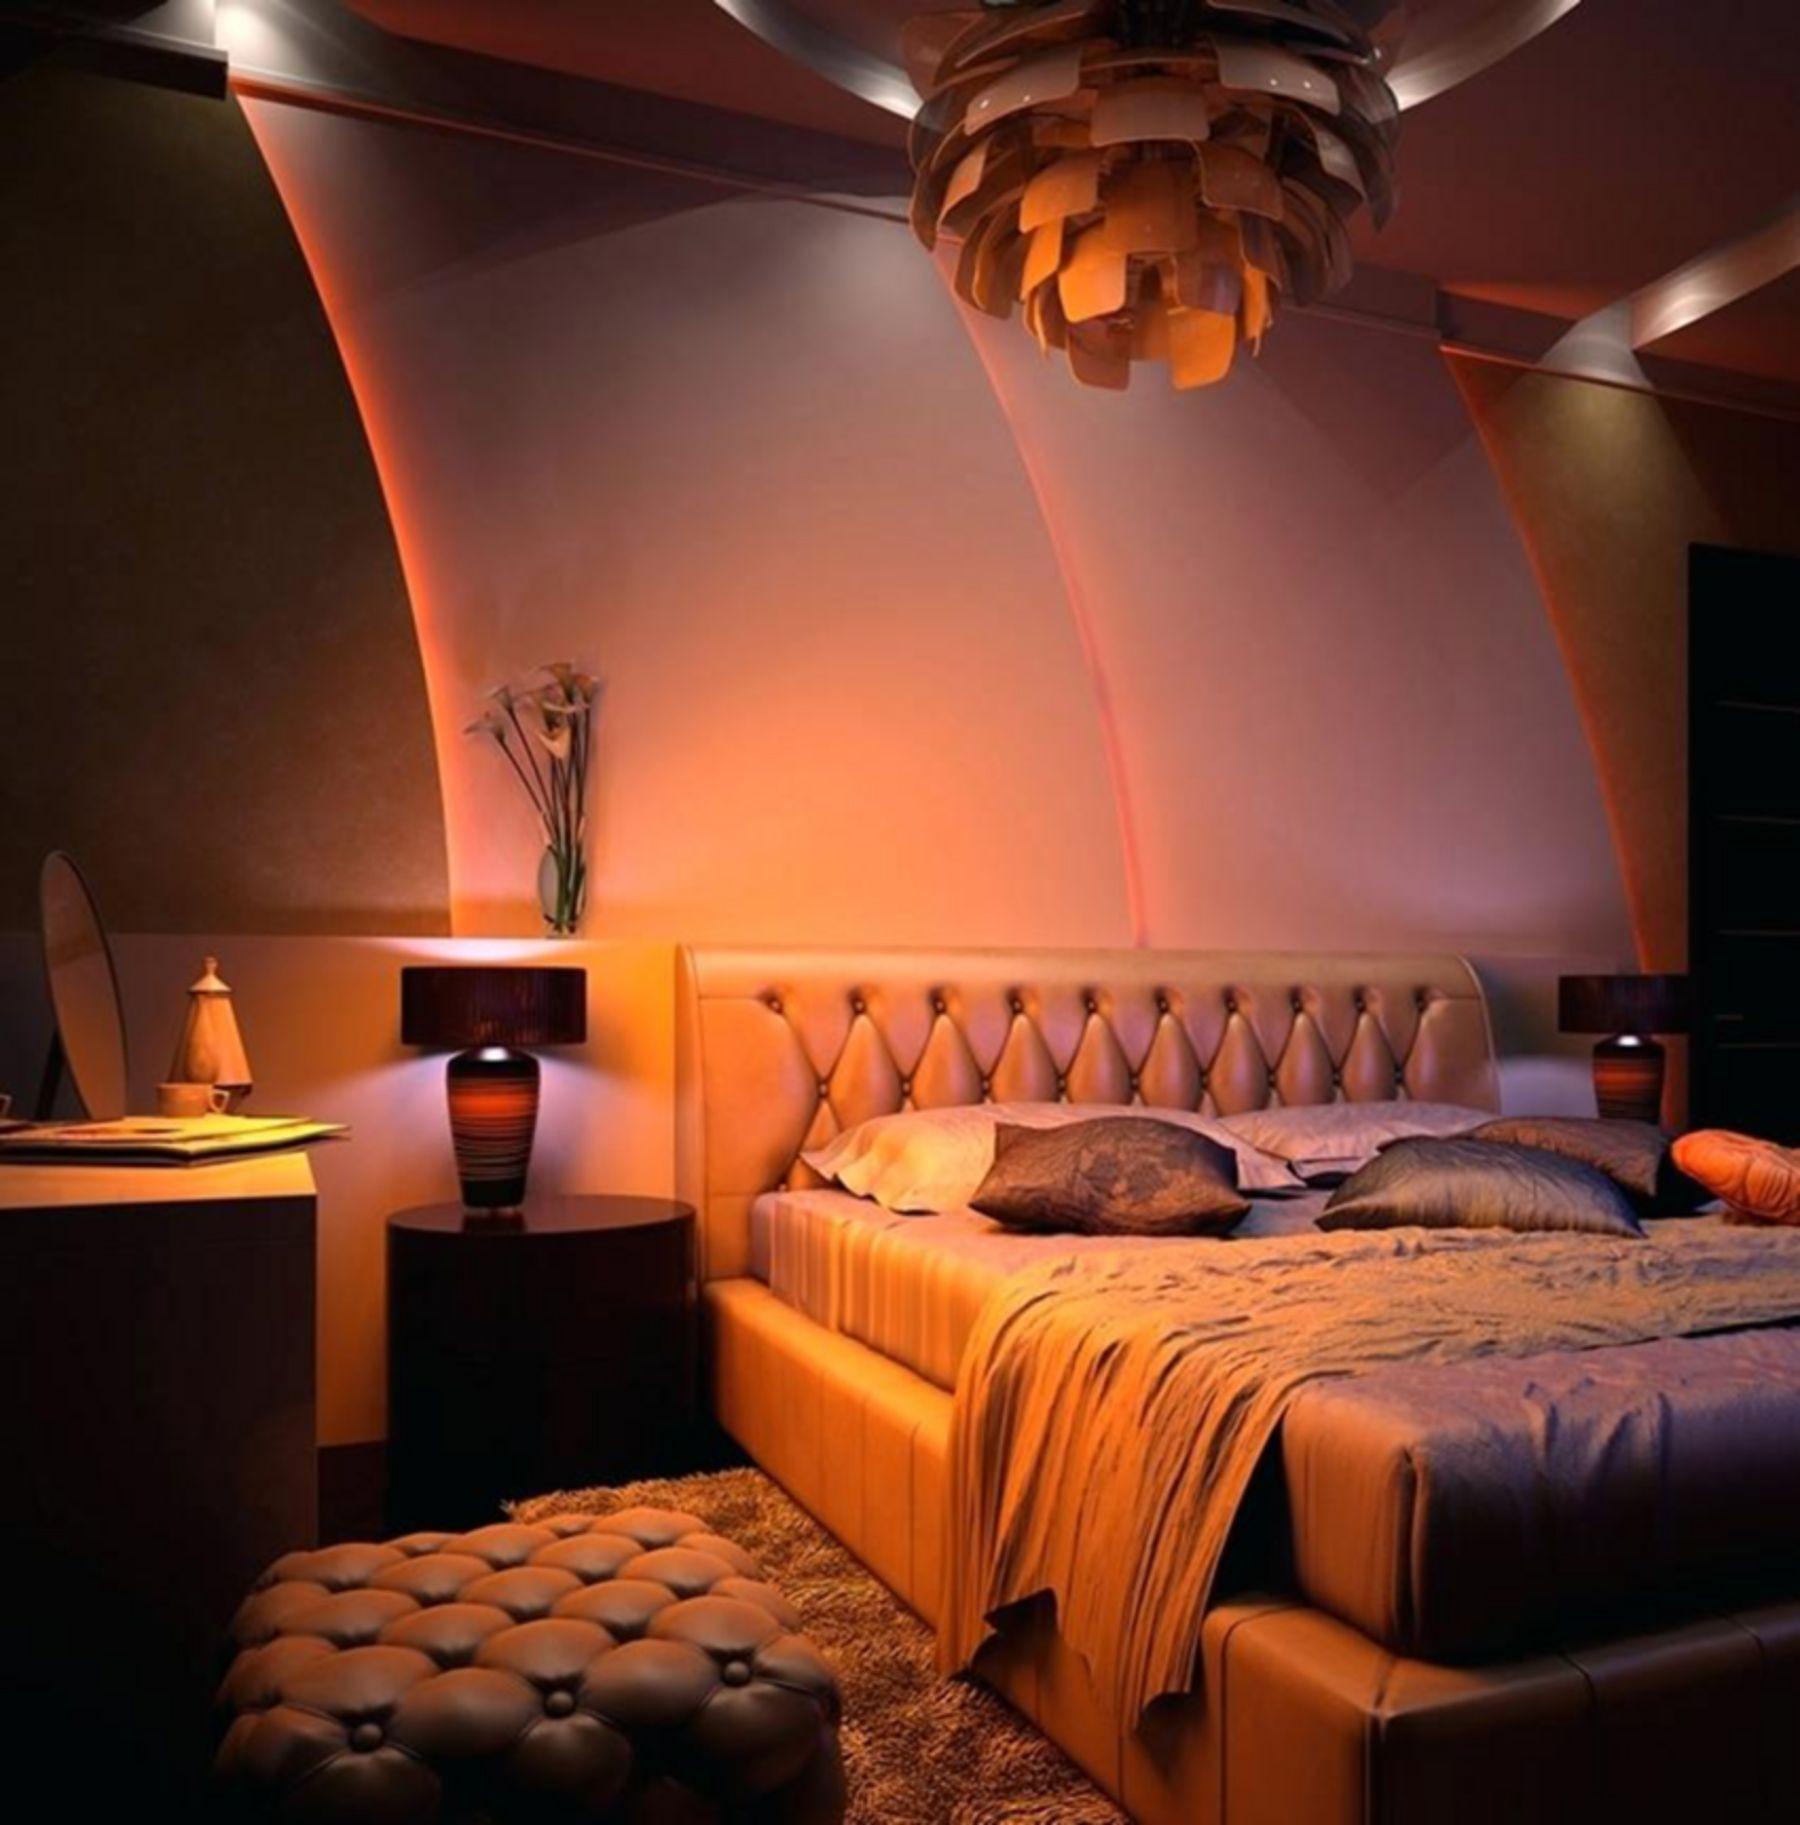 20 Romantic Bedroom Ideas: 20+ Lovely Romantic Bedroom Design Ideas For Feeling